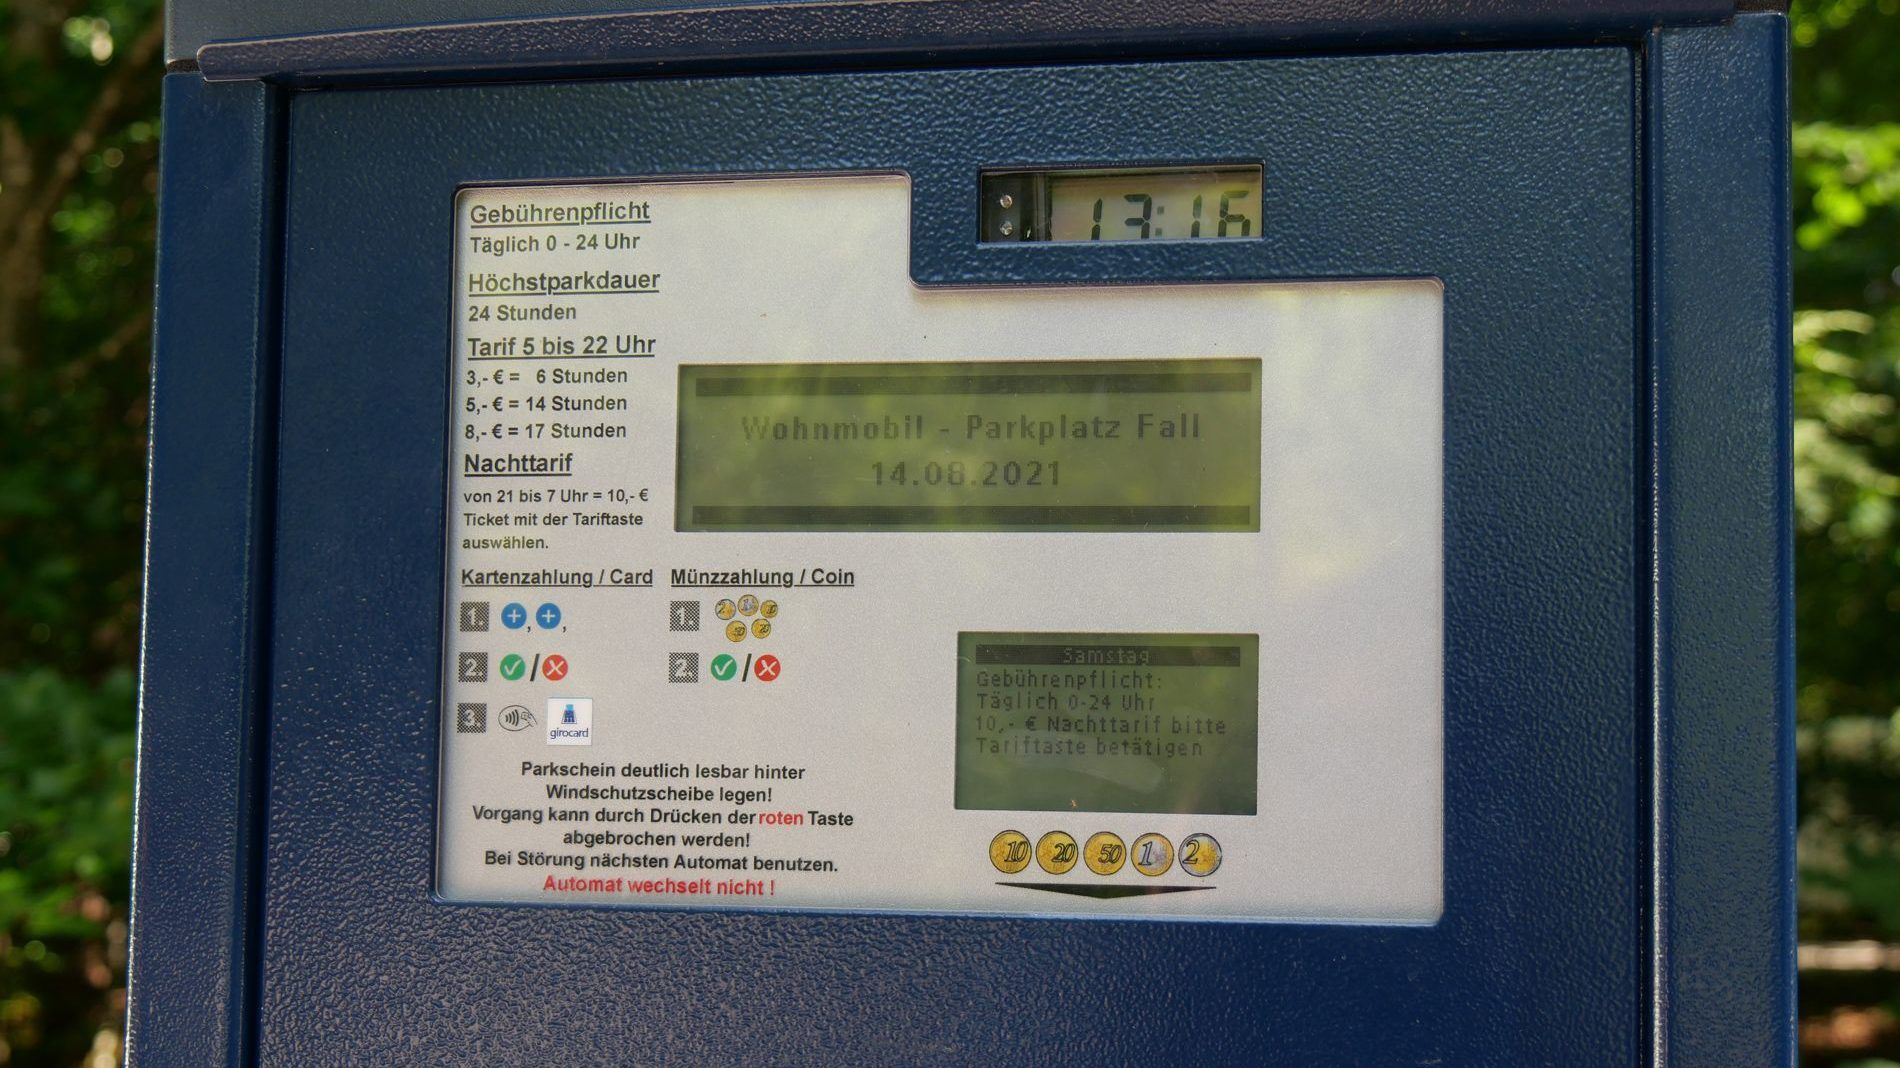 Parkautomat Sylvenstein edited